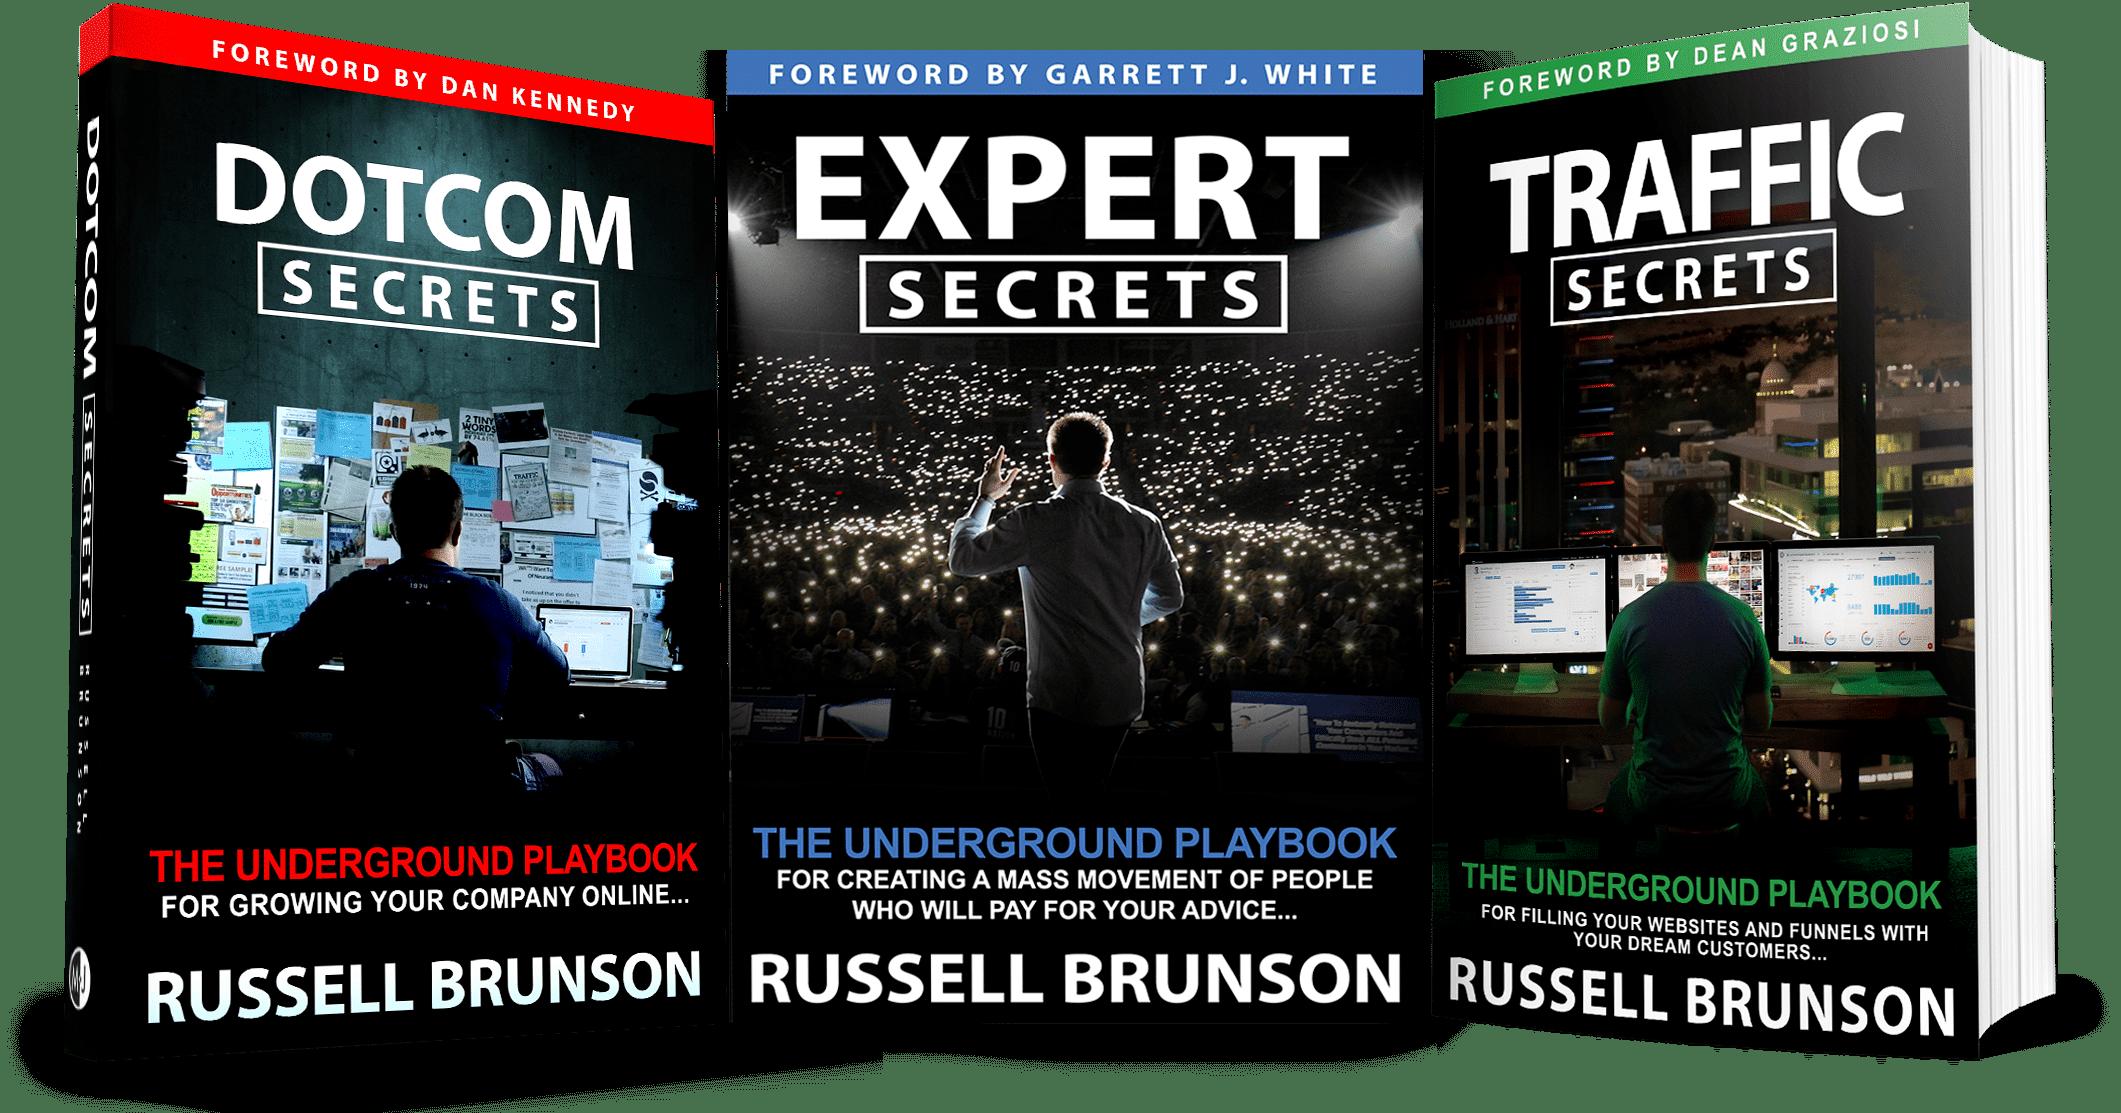 traffic secrets review: third book